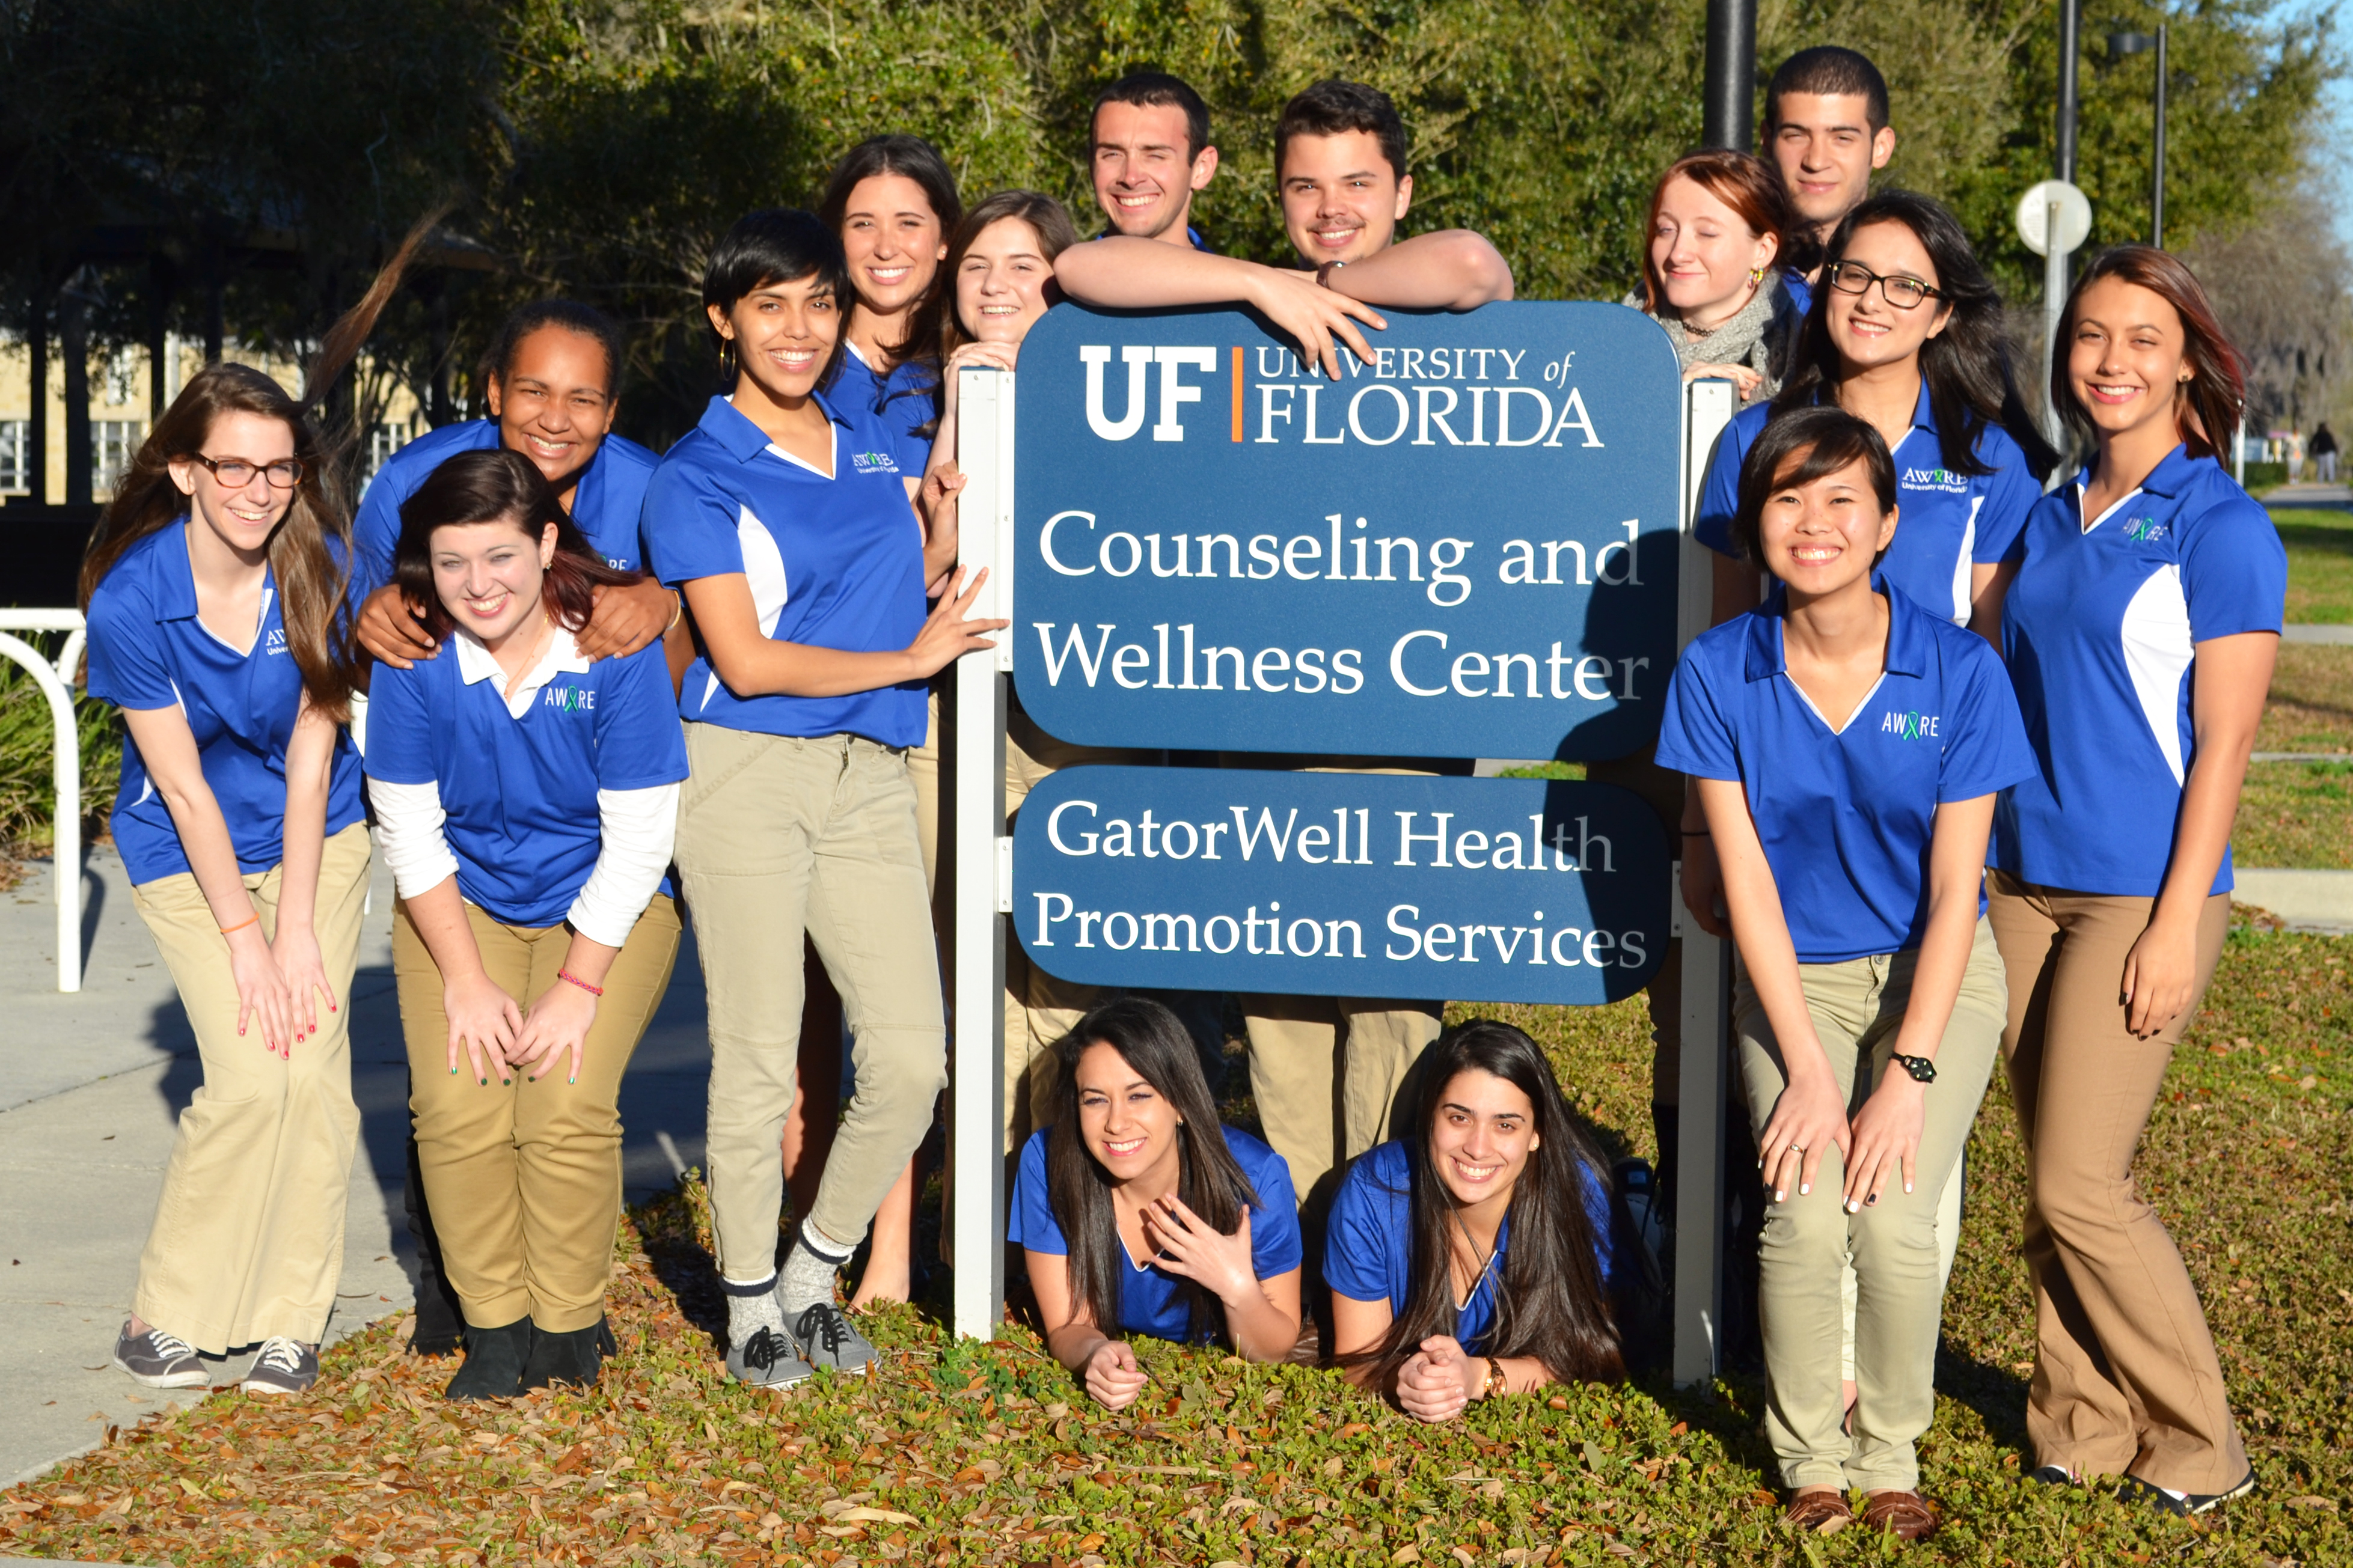 group photo of 2014-15 aware ambassadors